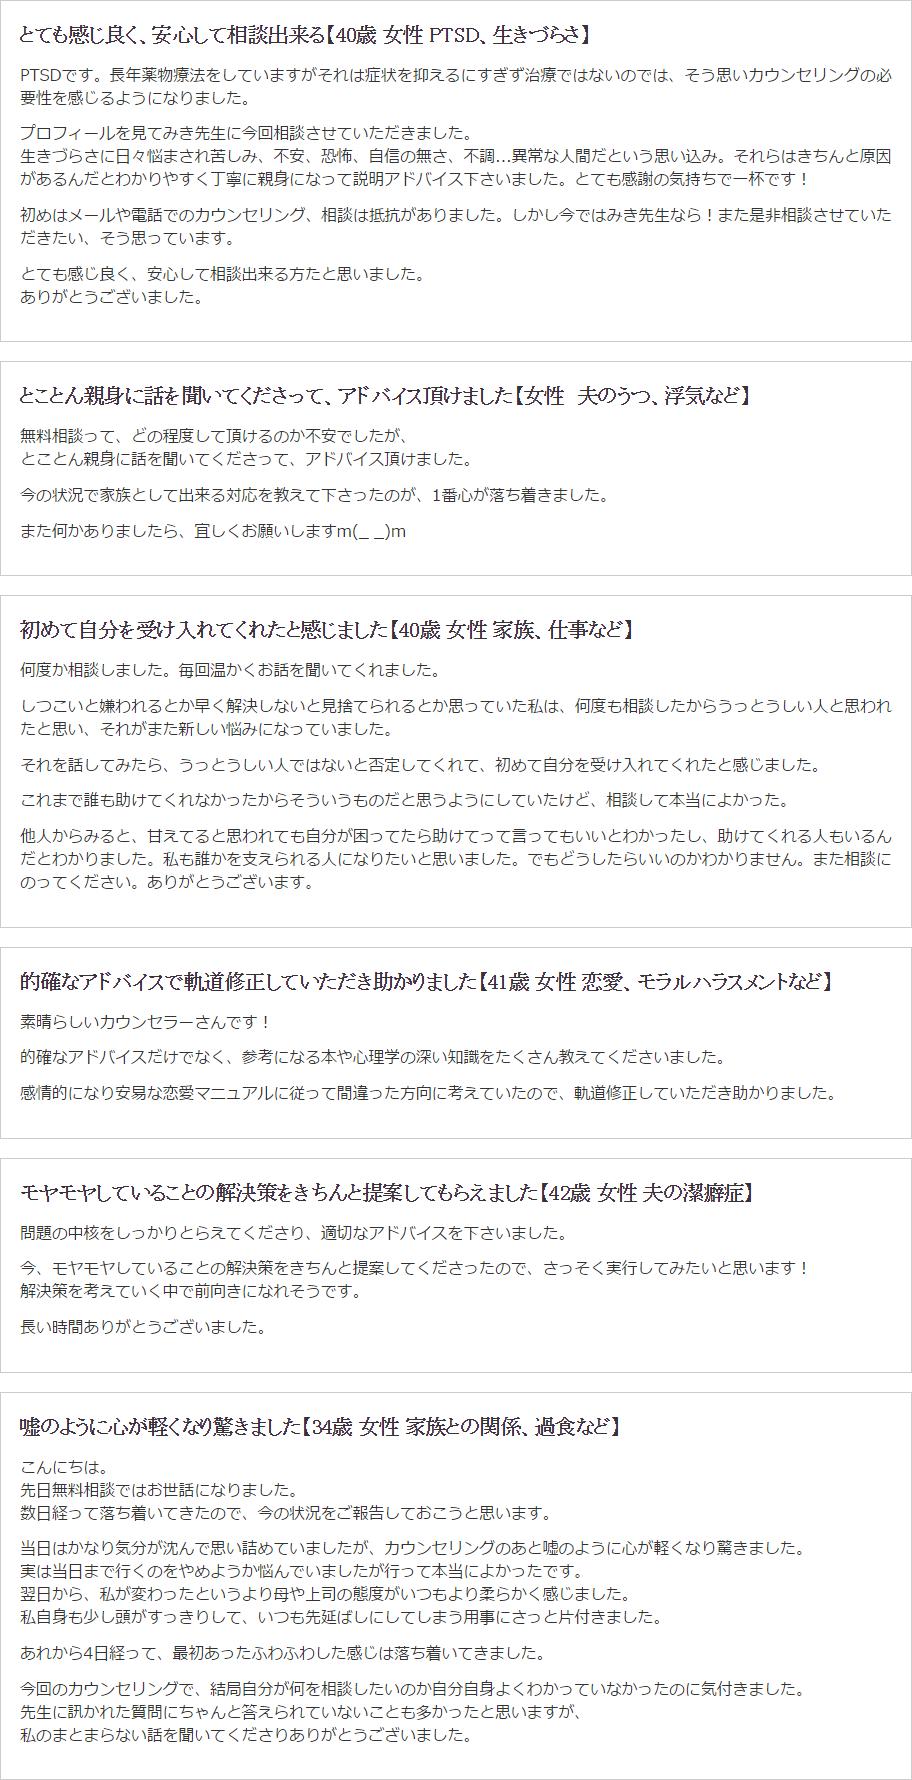 screenshot_235